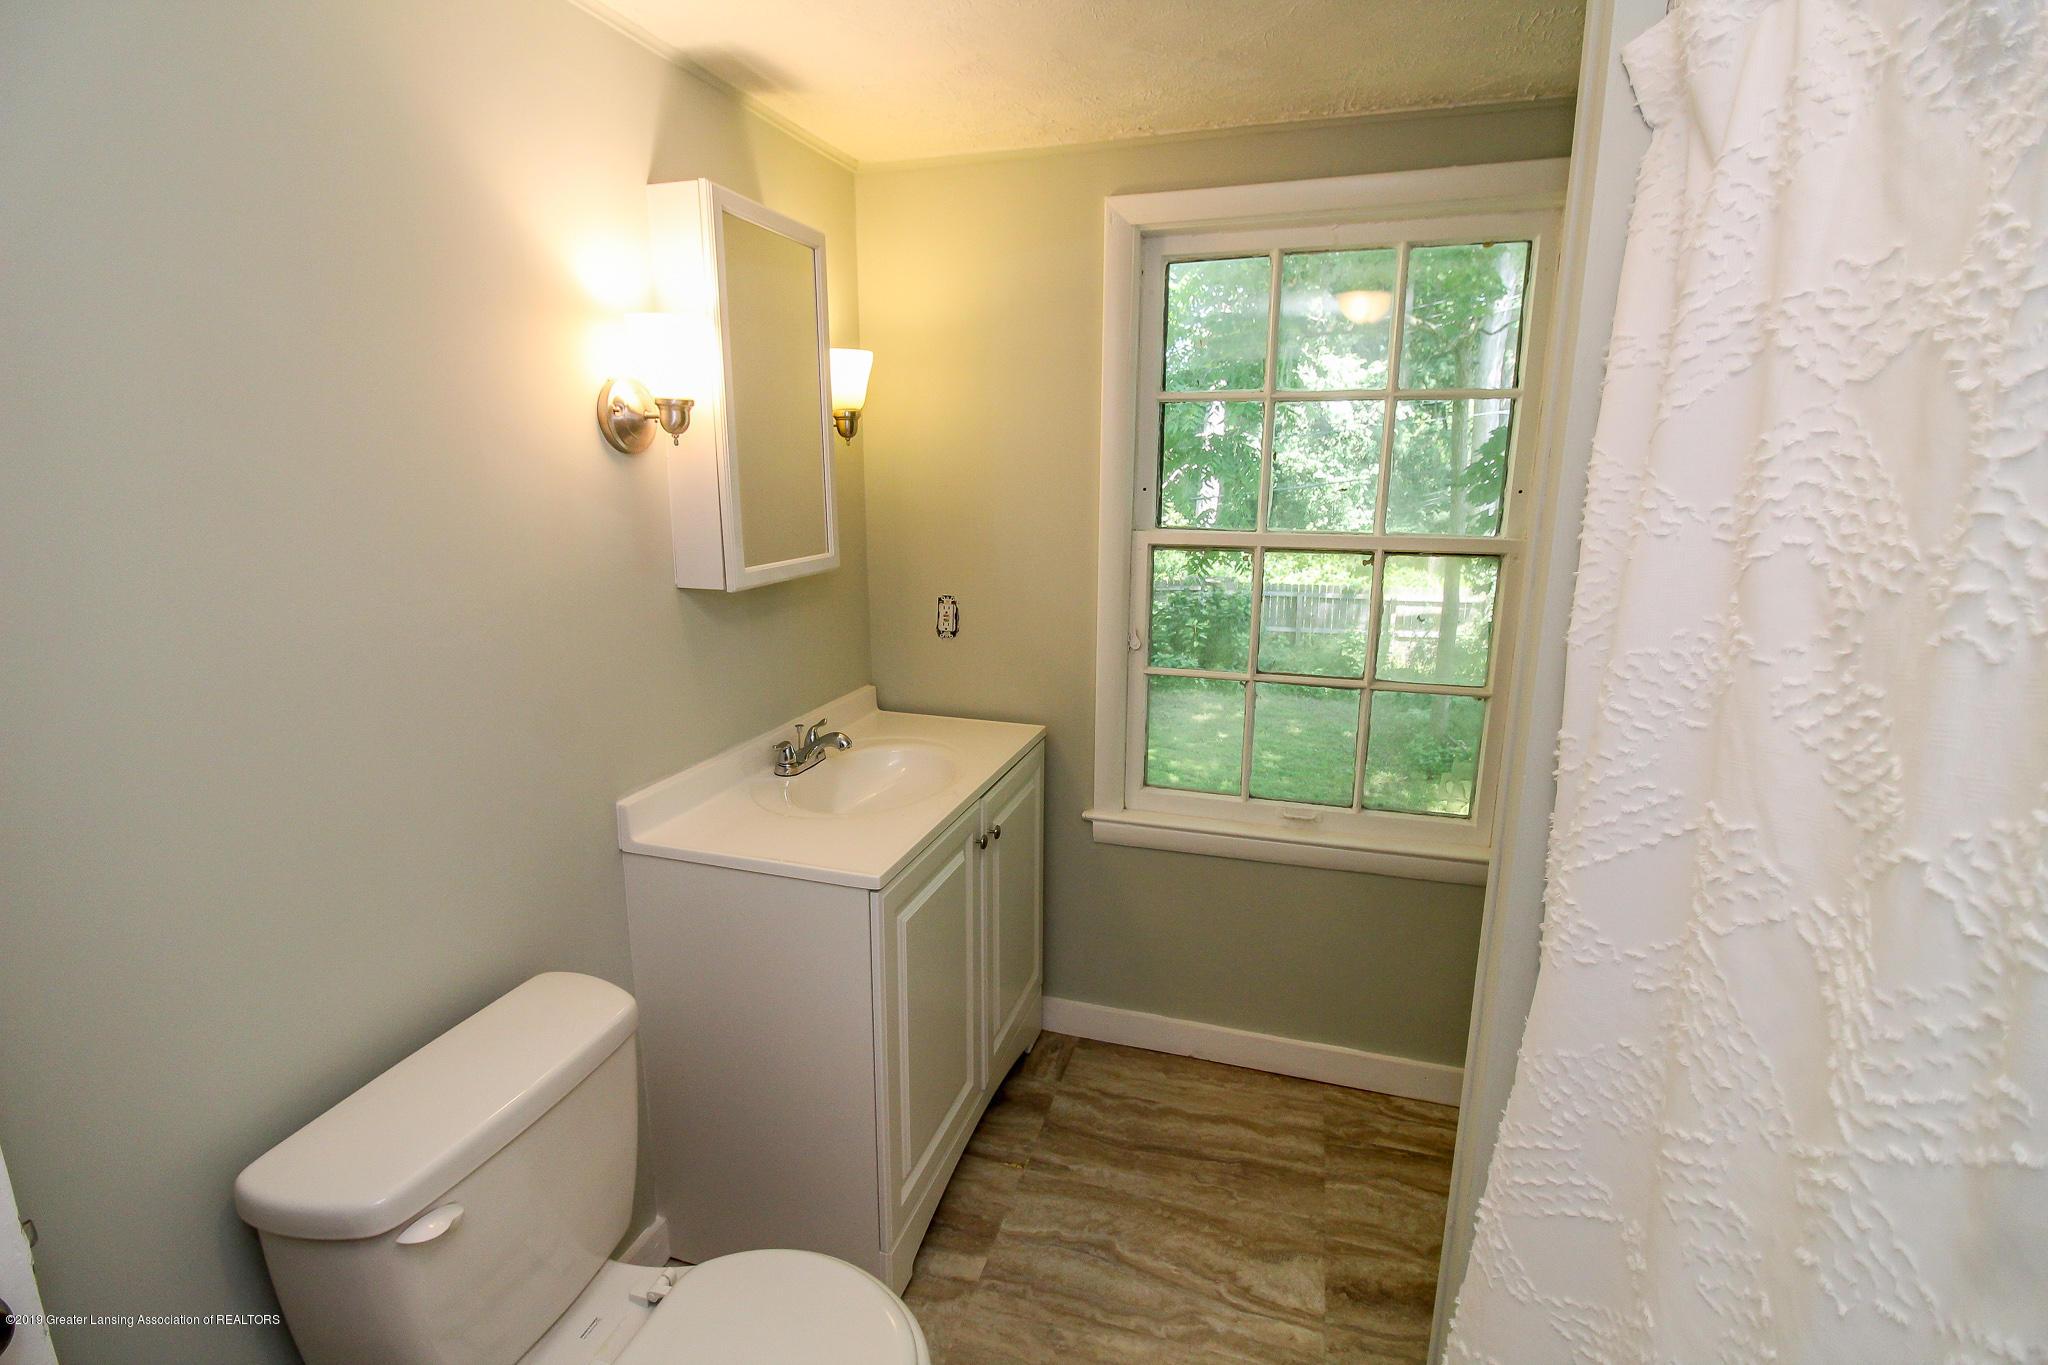 124 Northlawn Ave - 31 Second Floor Bathroom 1 - 25